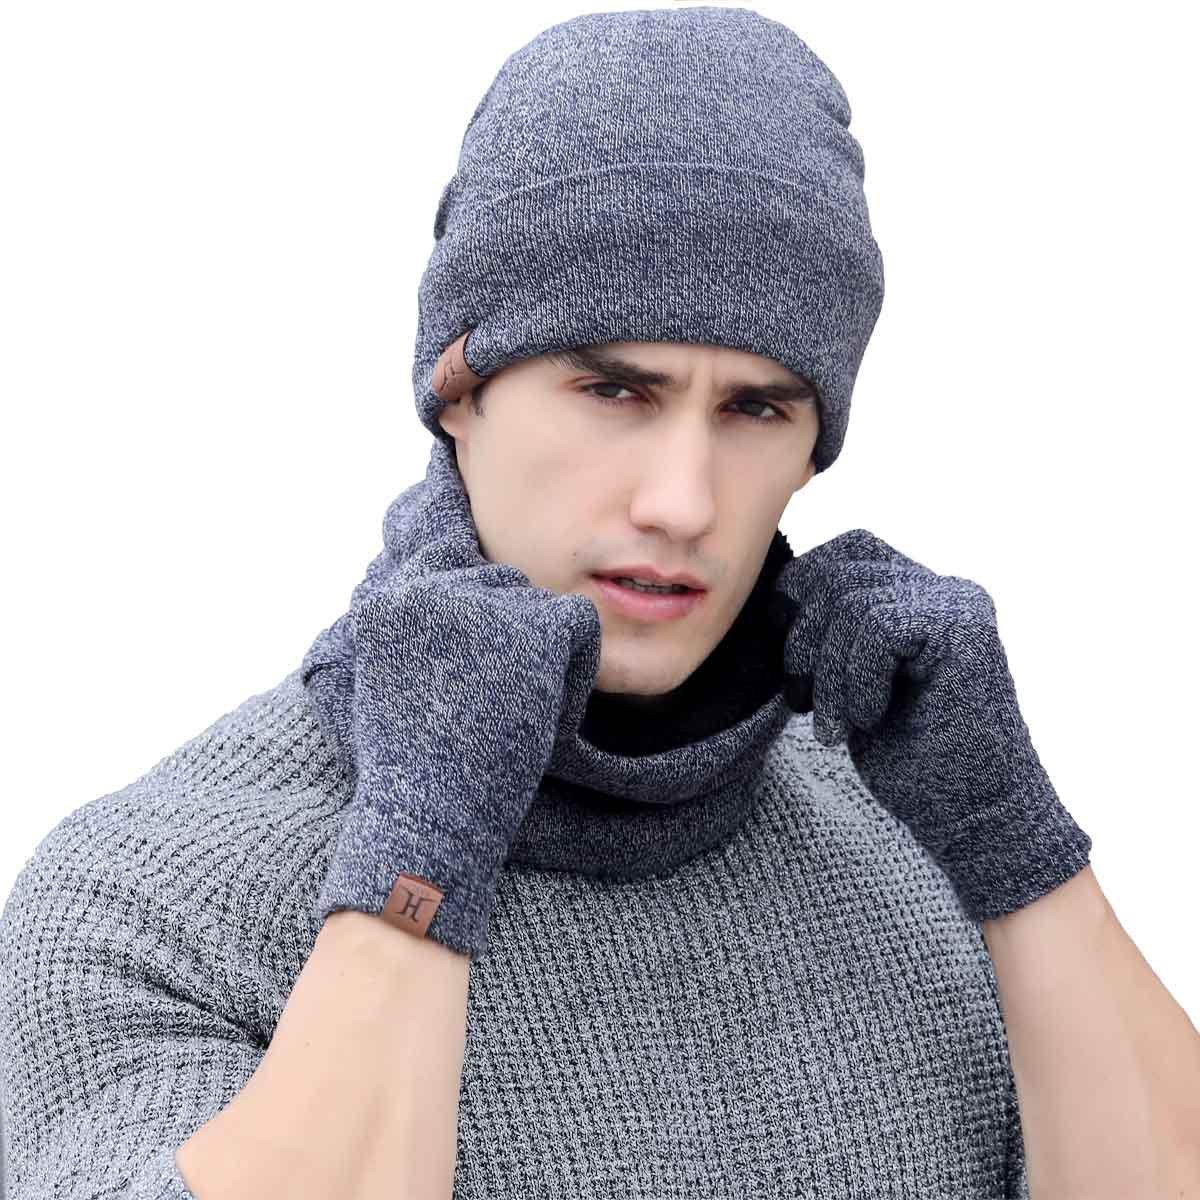 871413f1f454 Gorro Invierno Hombre con Bufanda, Calentar Sombreros Gorras Beanie ...